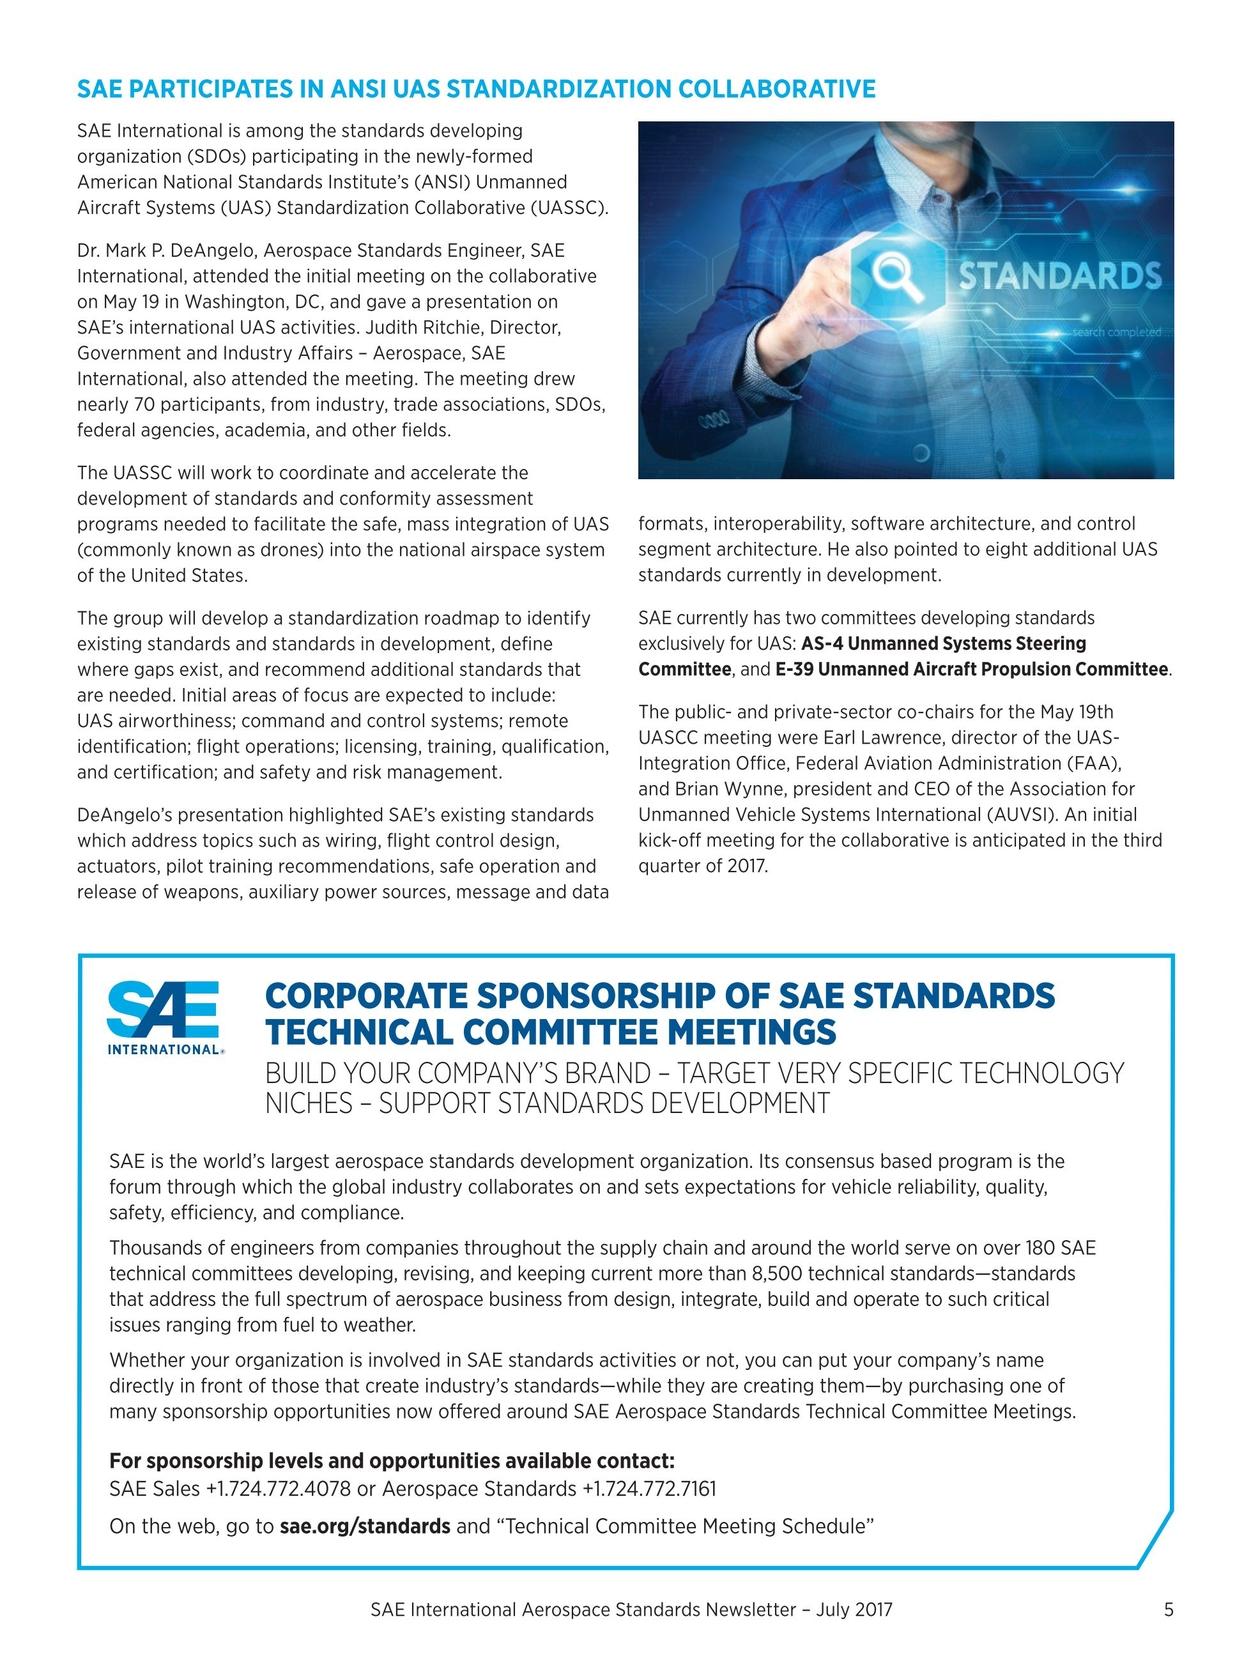 aerospace standards newsletter july 2017